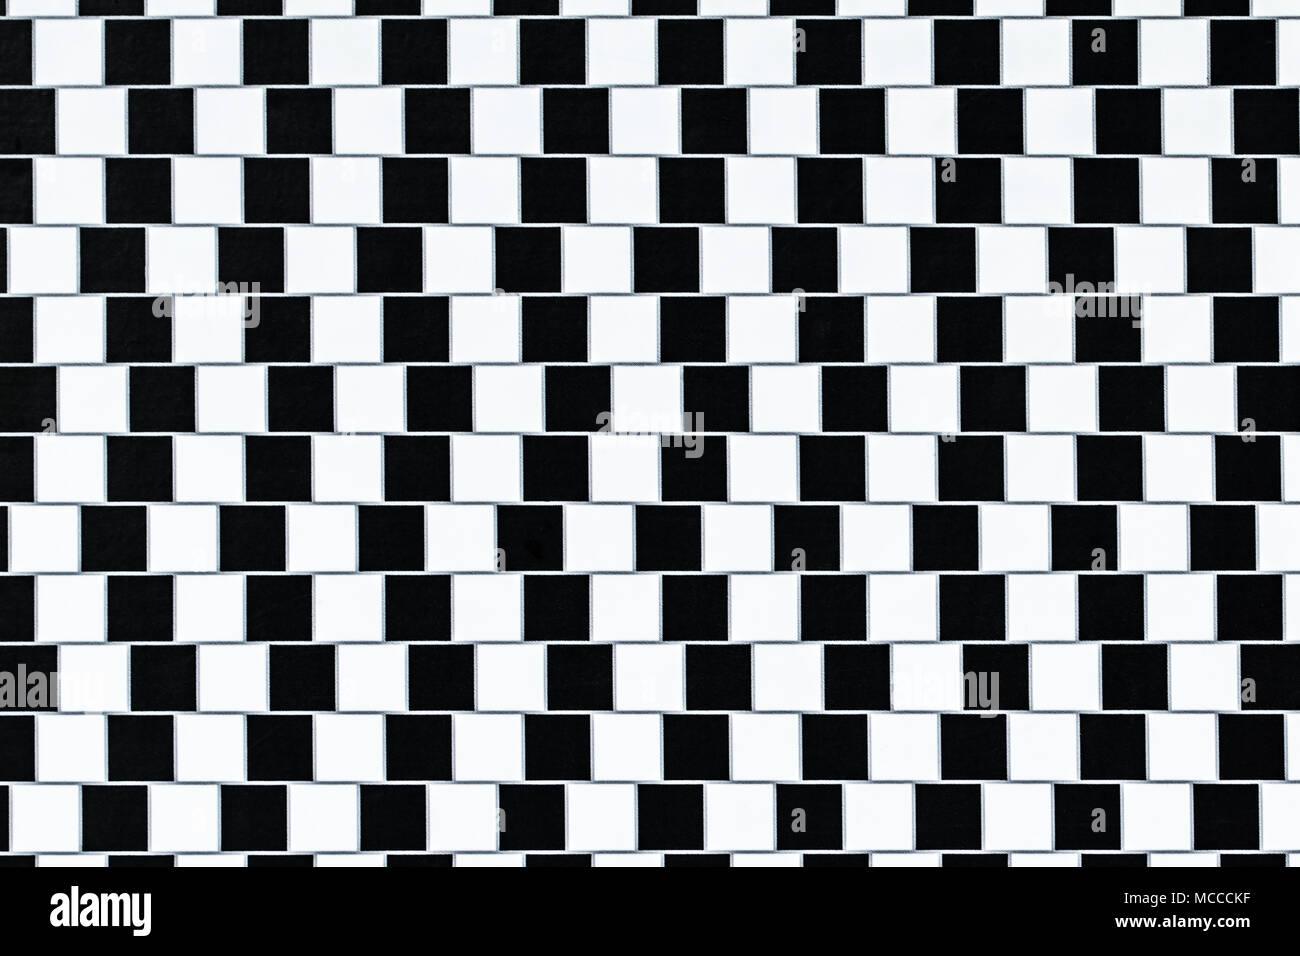 Las líneas son paralelas pero parecen estar sesgadas - ilusión óptica. Imagen De Stock